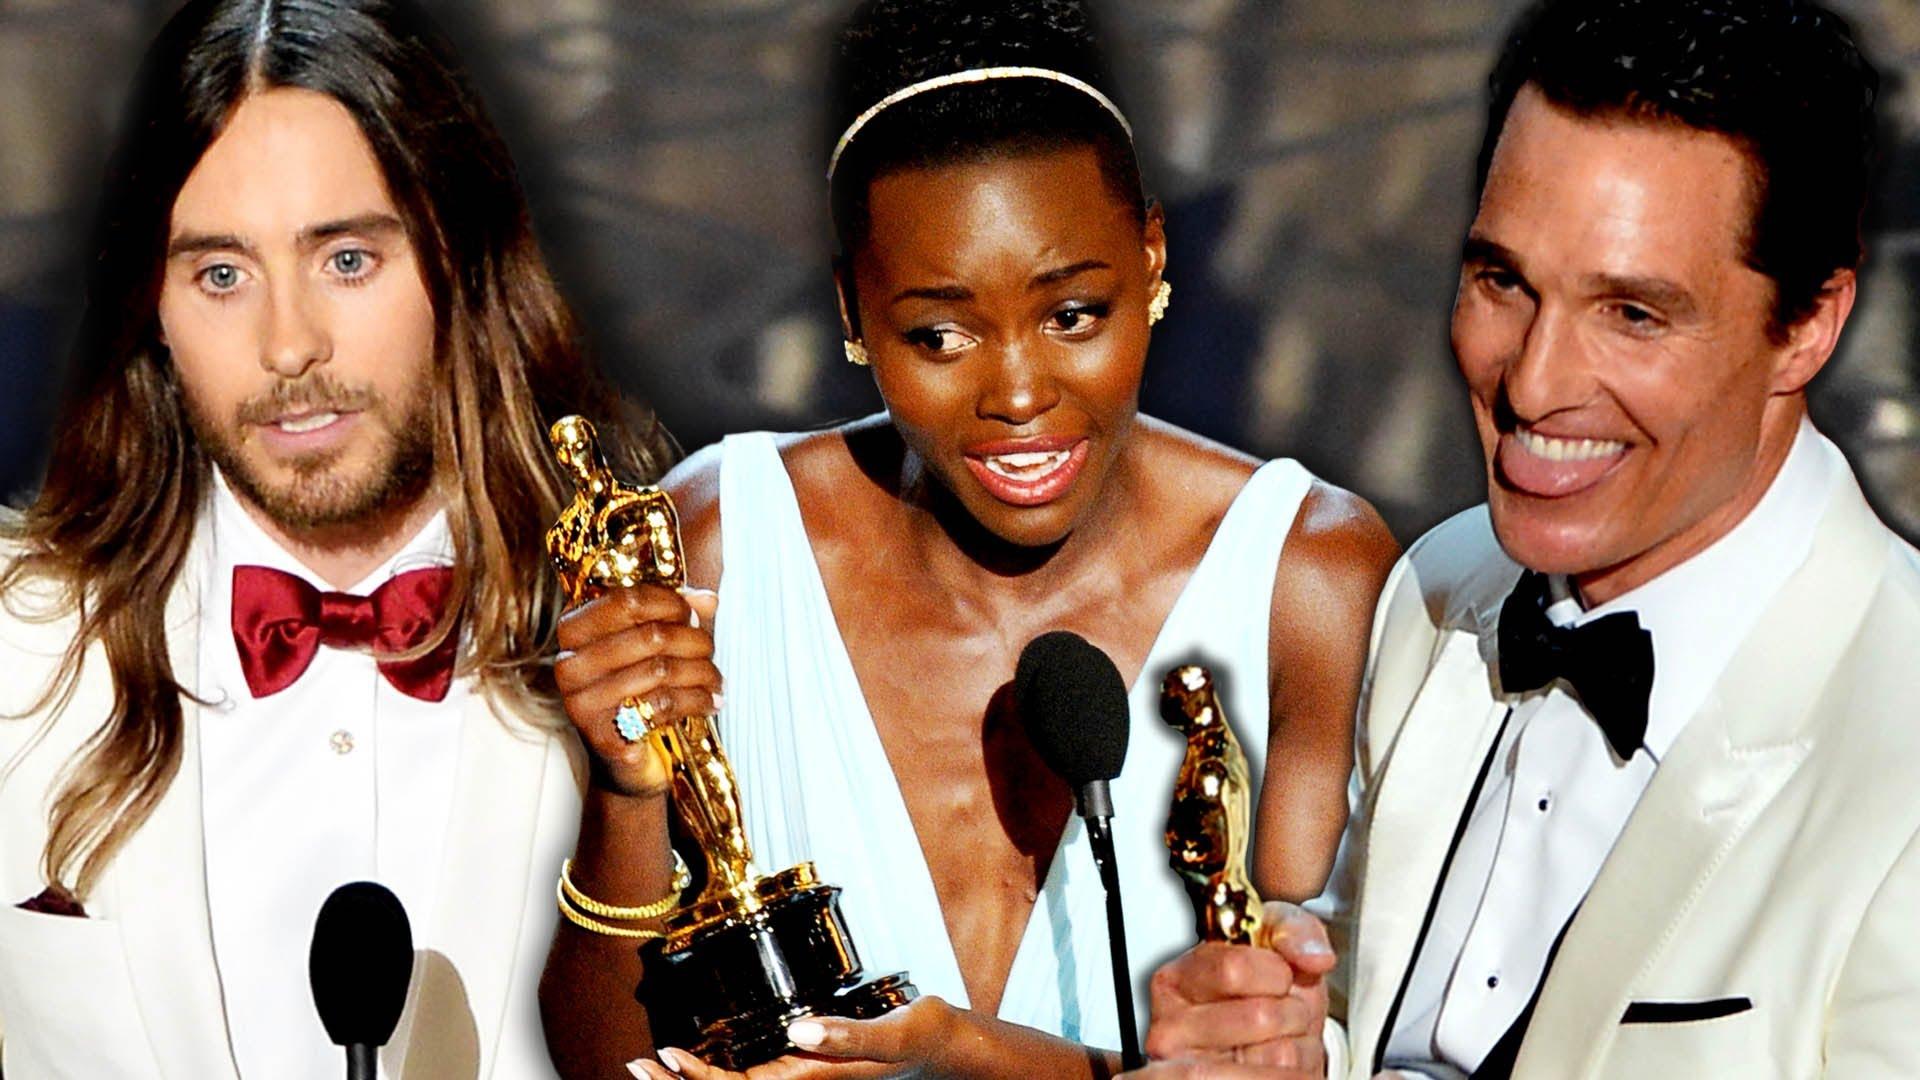 「2014奧斯卡:最難忘的七段得獎感言」- Oscars 2014: 7 Memorable Acceptance Speeches!